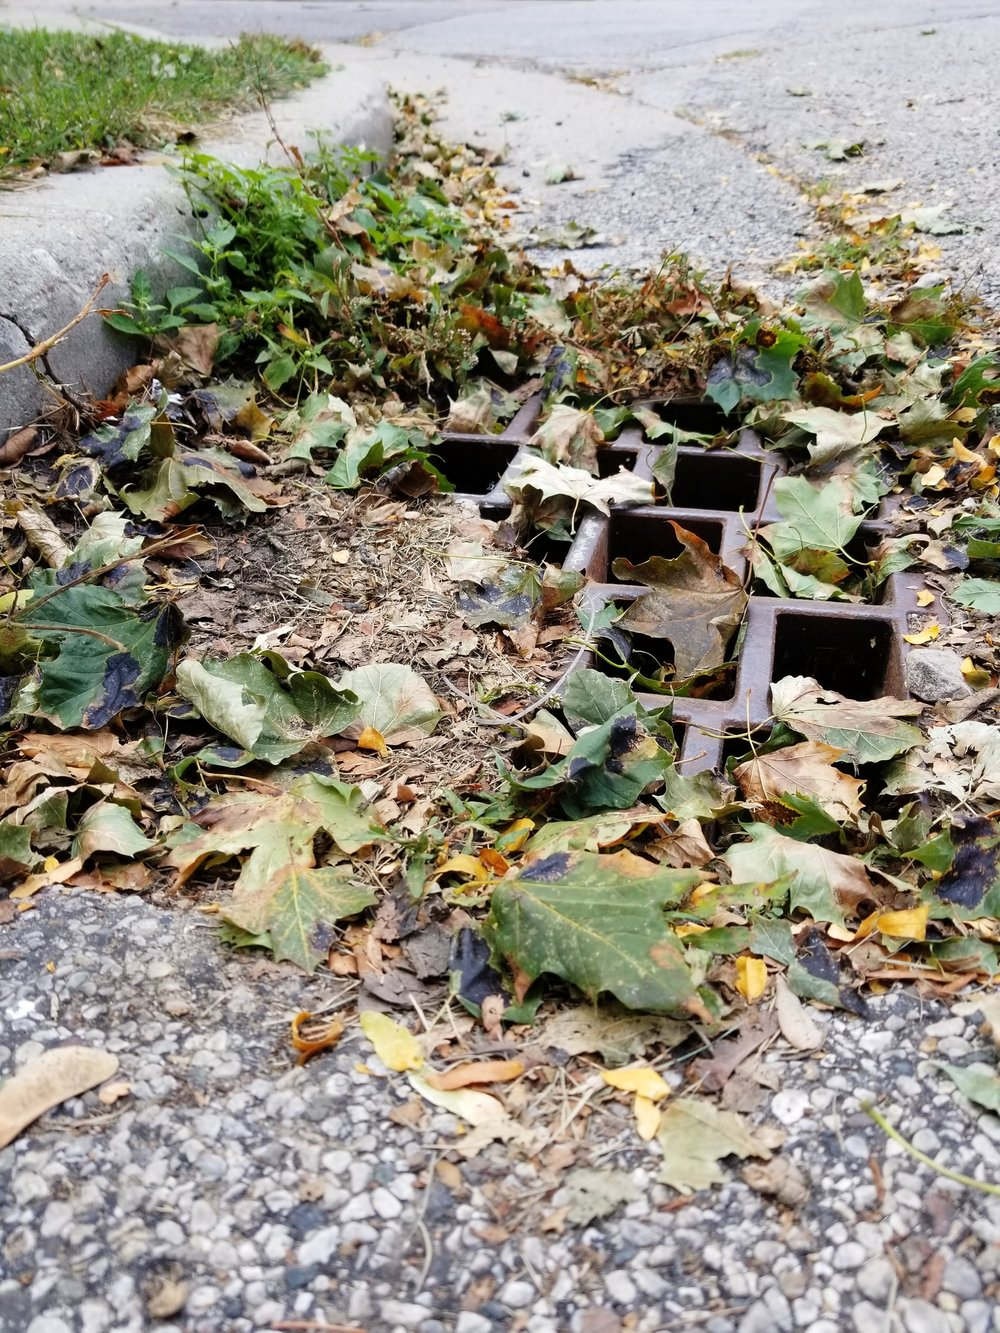 Debris in a storm drain...